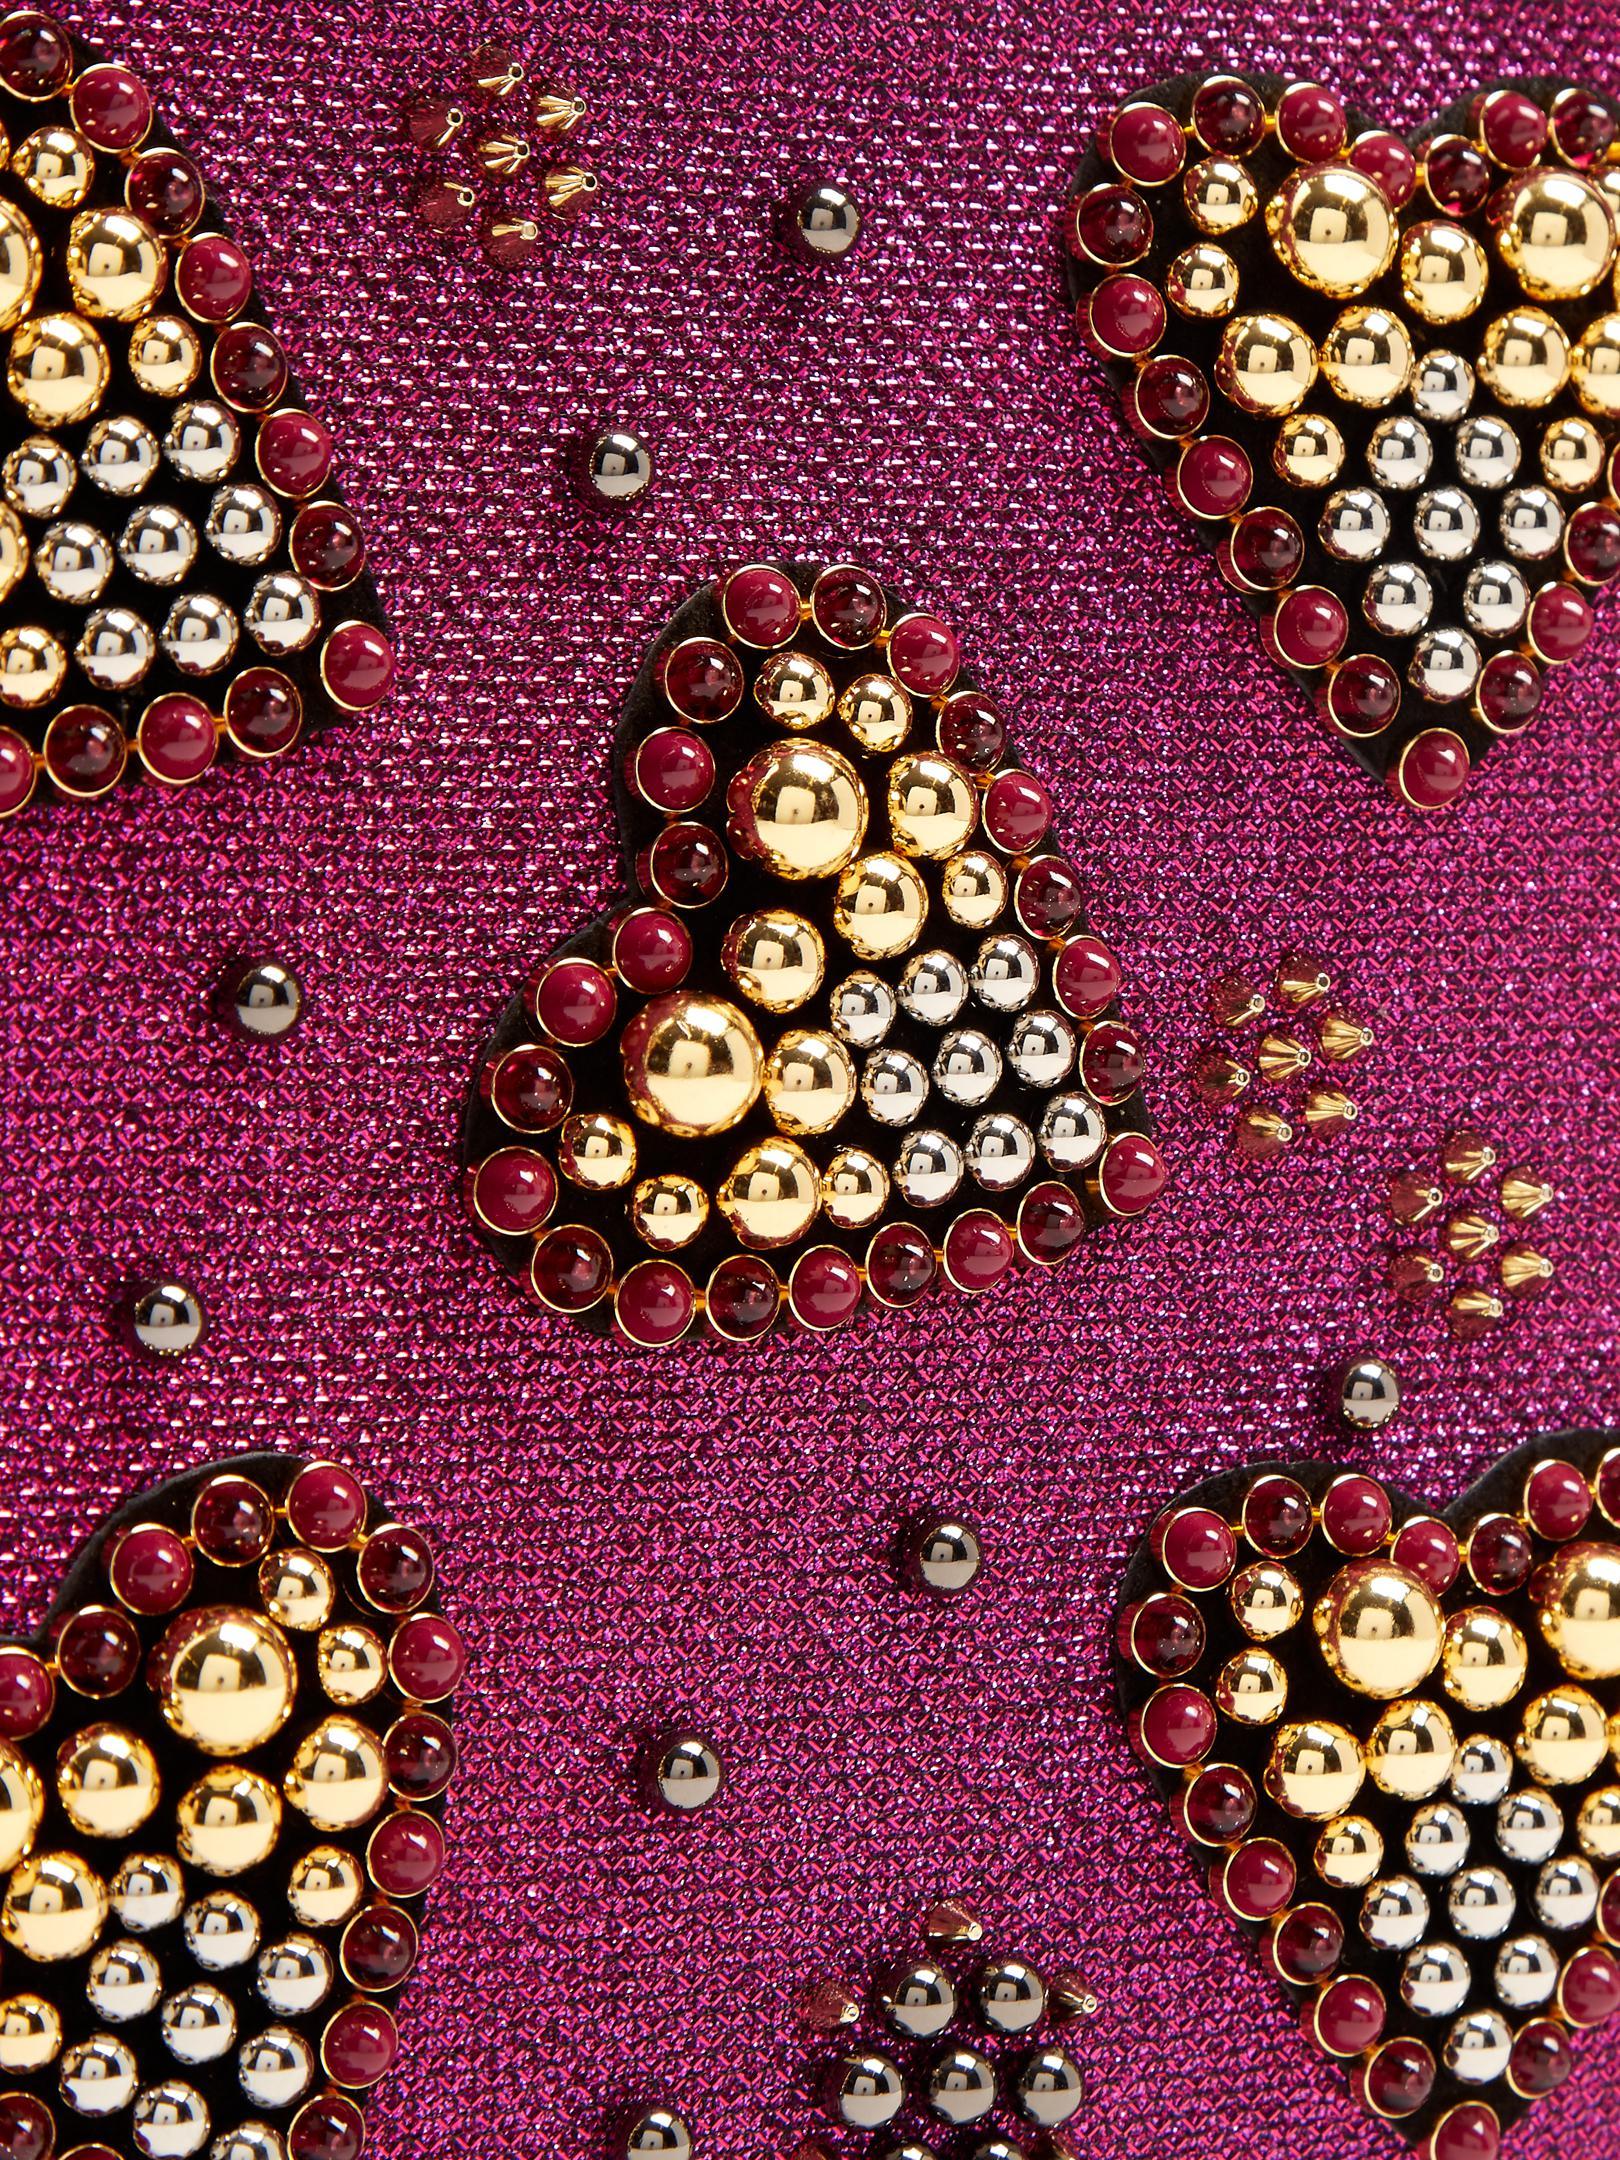 fce4b2aa986 Christian Louboutin Loubiposh Spike-embellished Glitter Pouch - Lyst